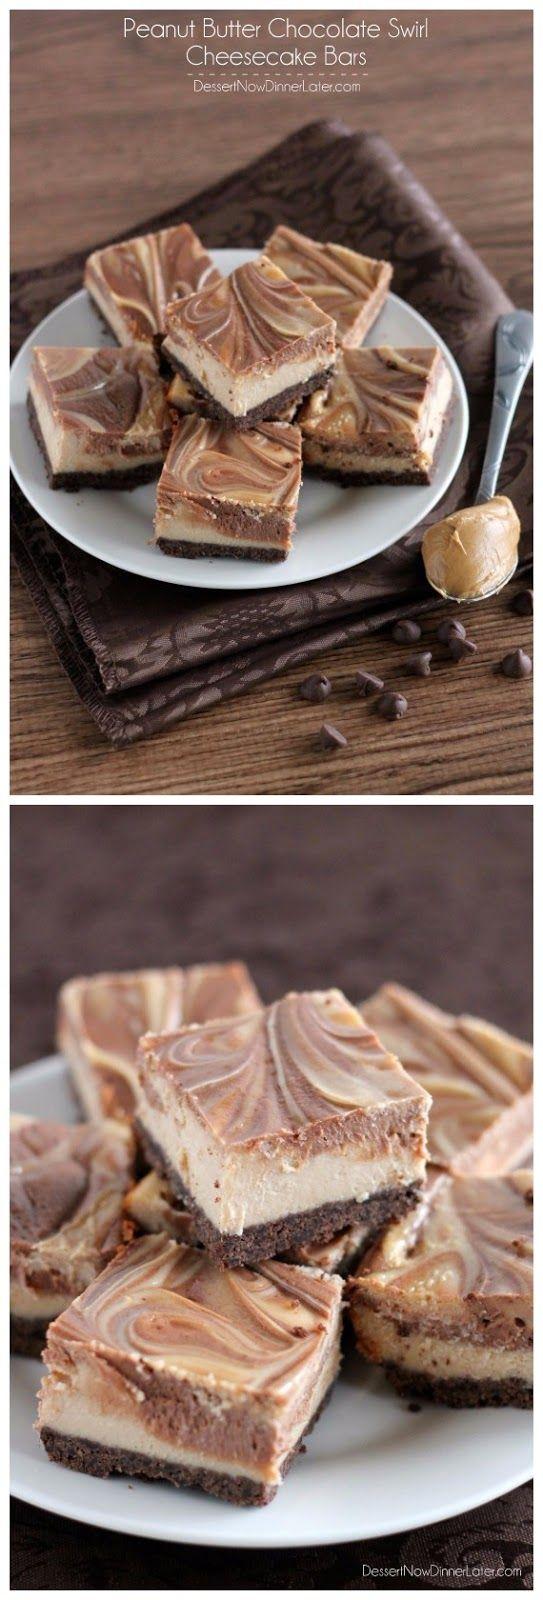 Peanut Butter Chocolate Swirl Cheesecake Bars - Food Recipes by Damla